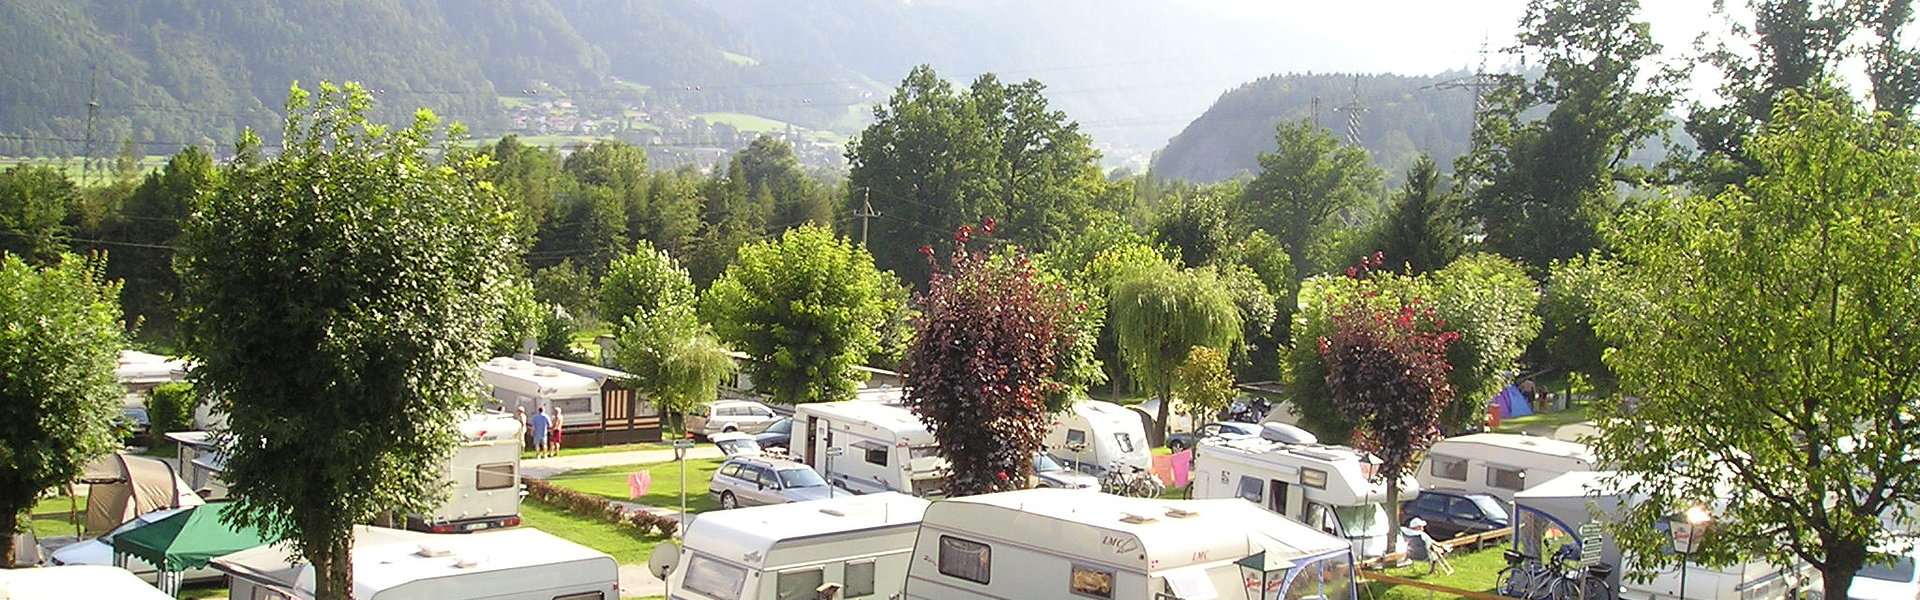 Campingurlaub - Camping Inntal